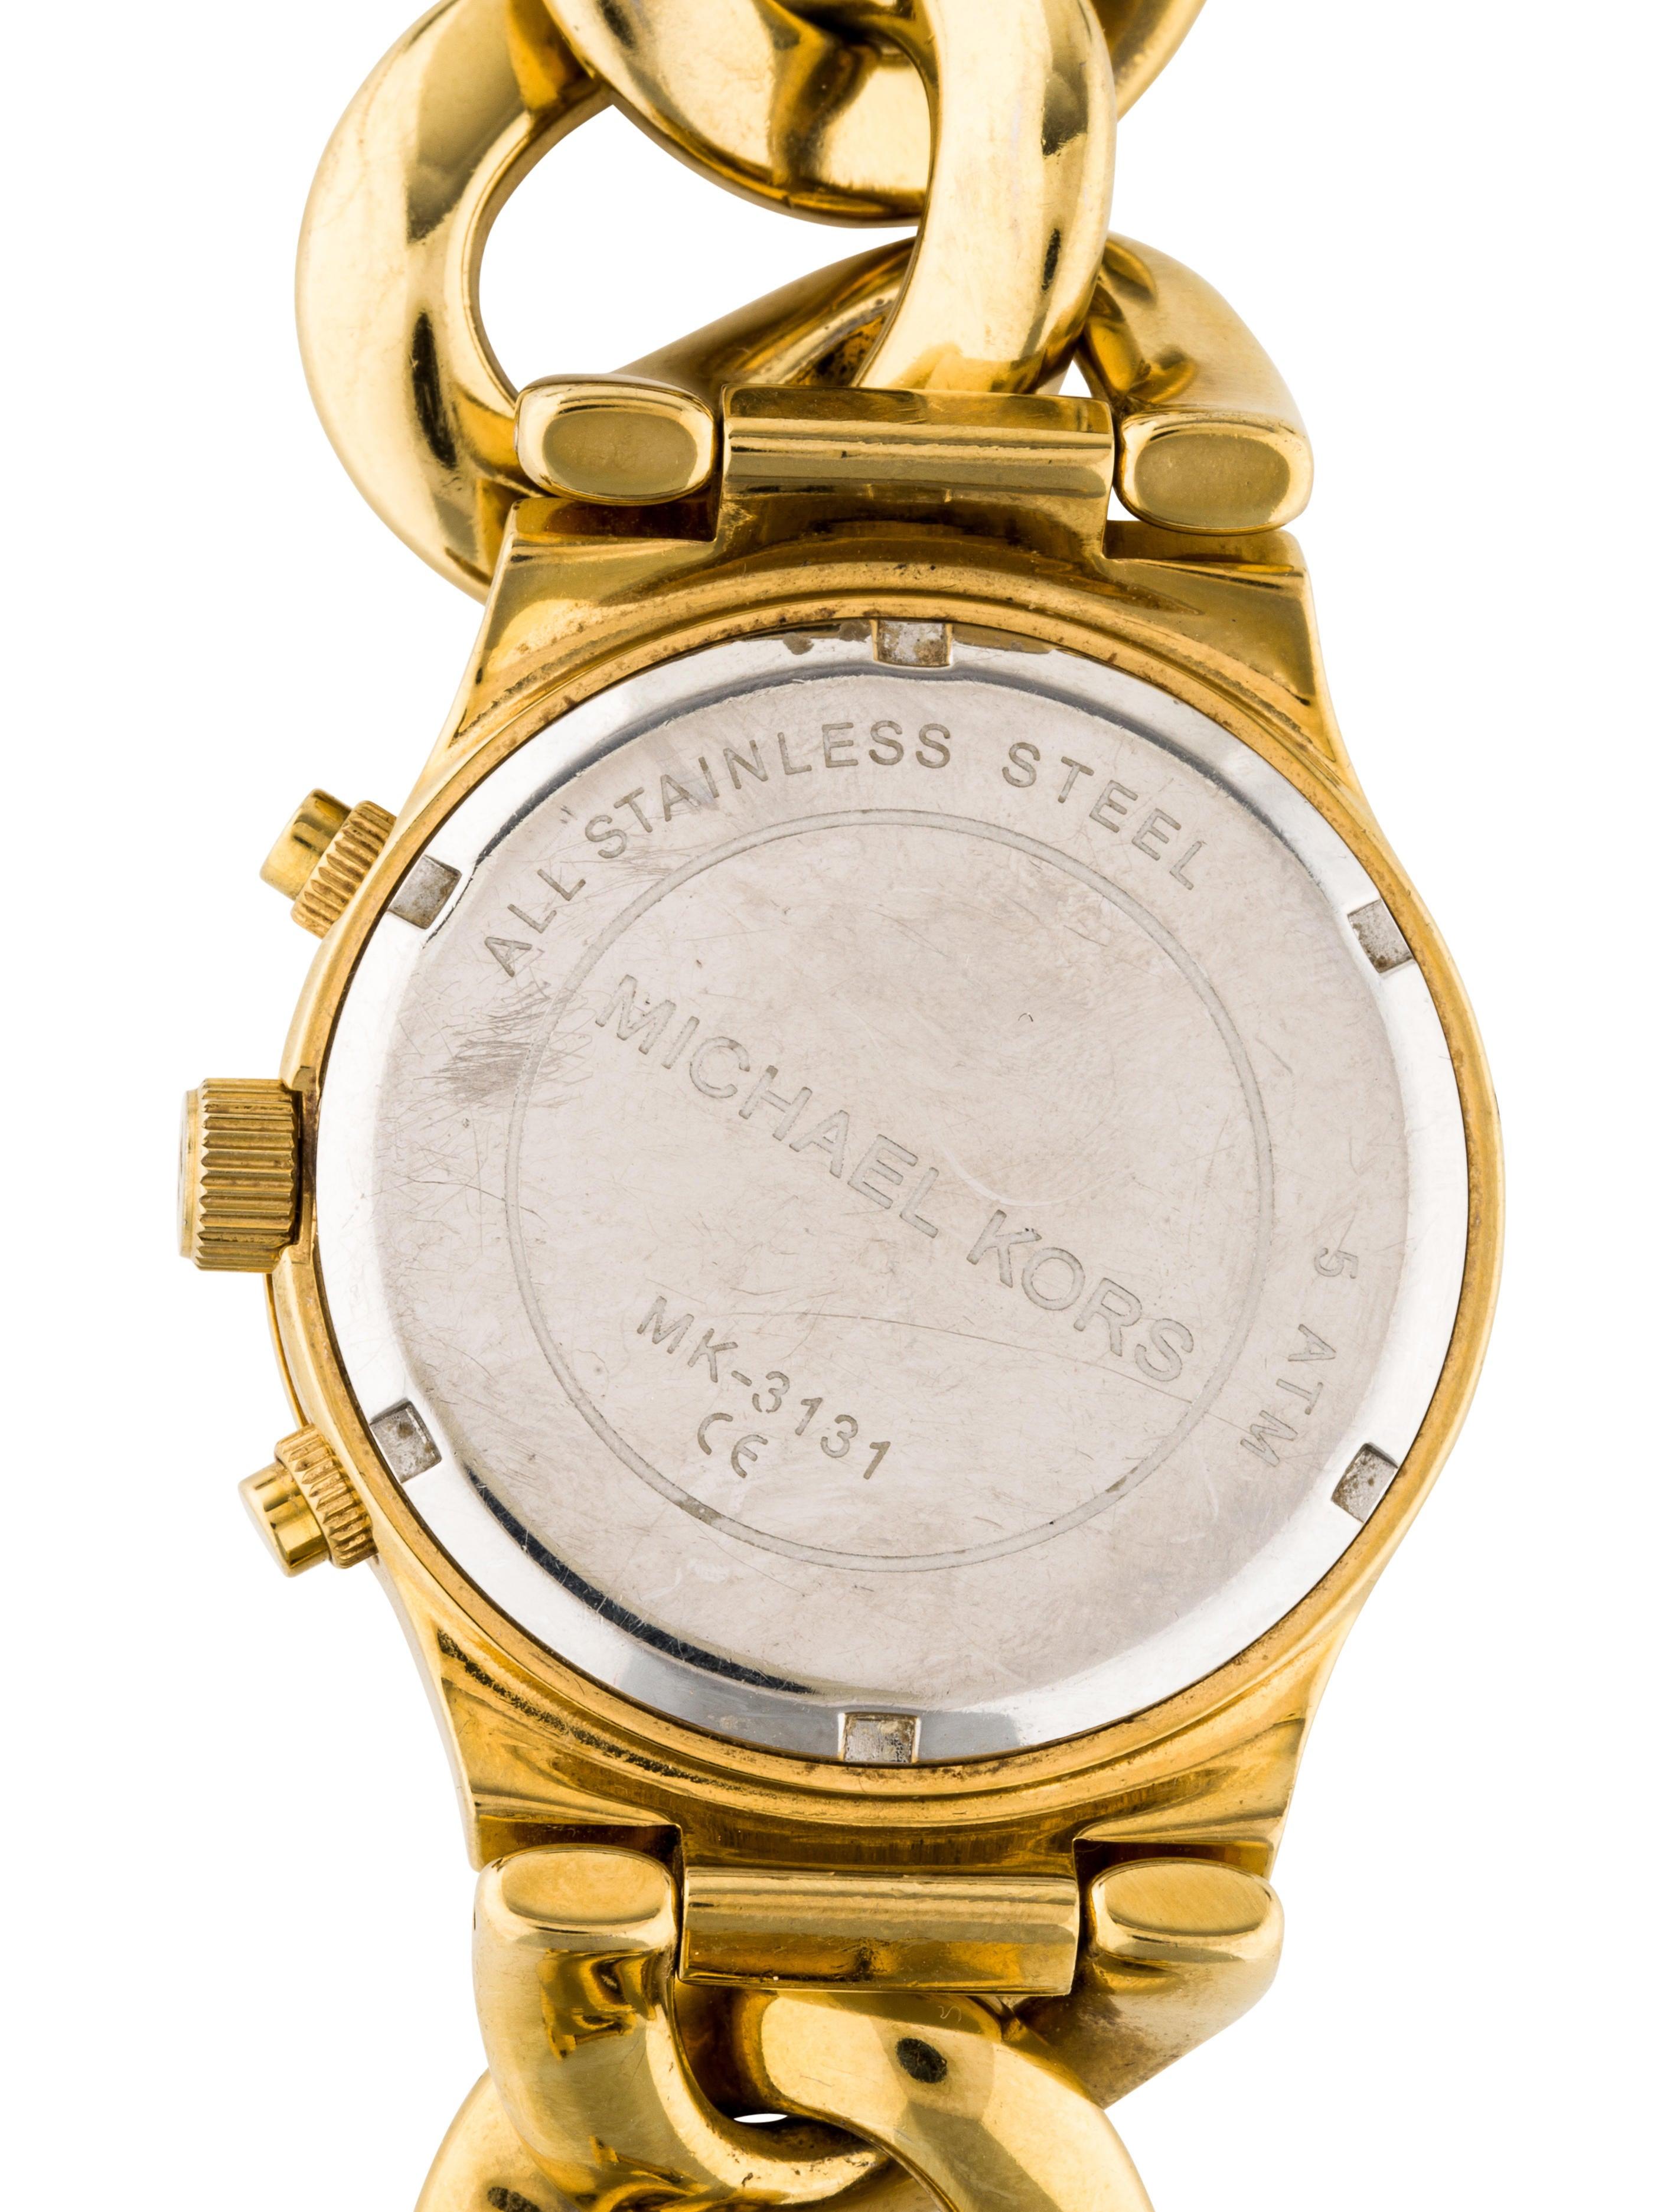 Michael Kors Runway Twist Watch Bracelet Mic59802 The Realreal 3131